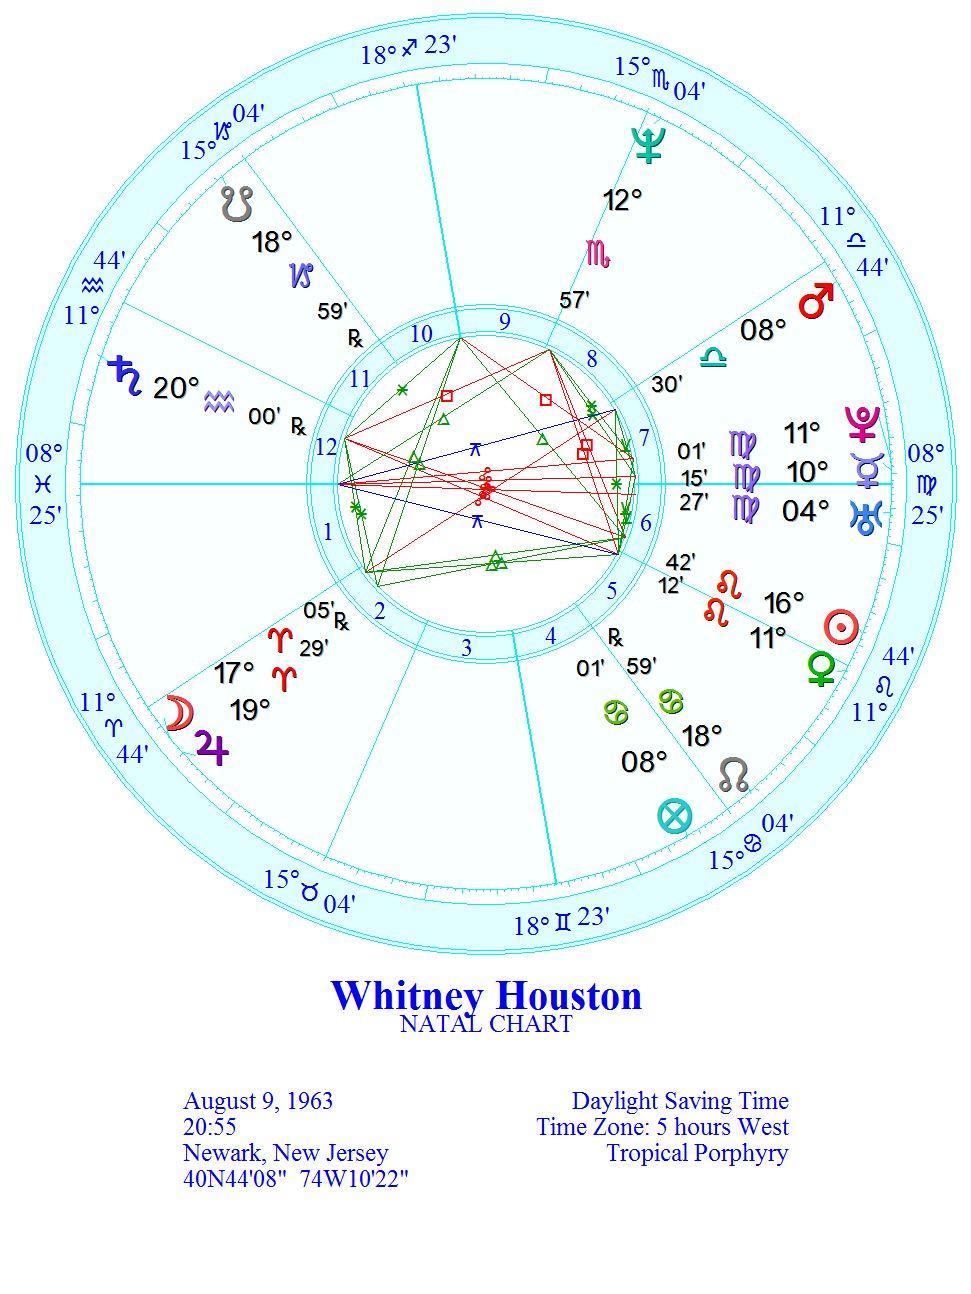 Astrology and everything else: Bobbi Kristina's death on